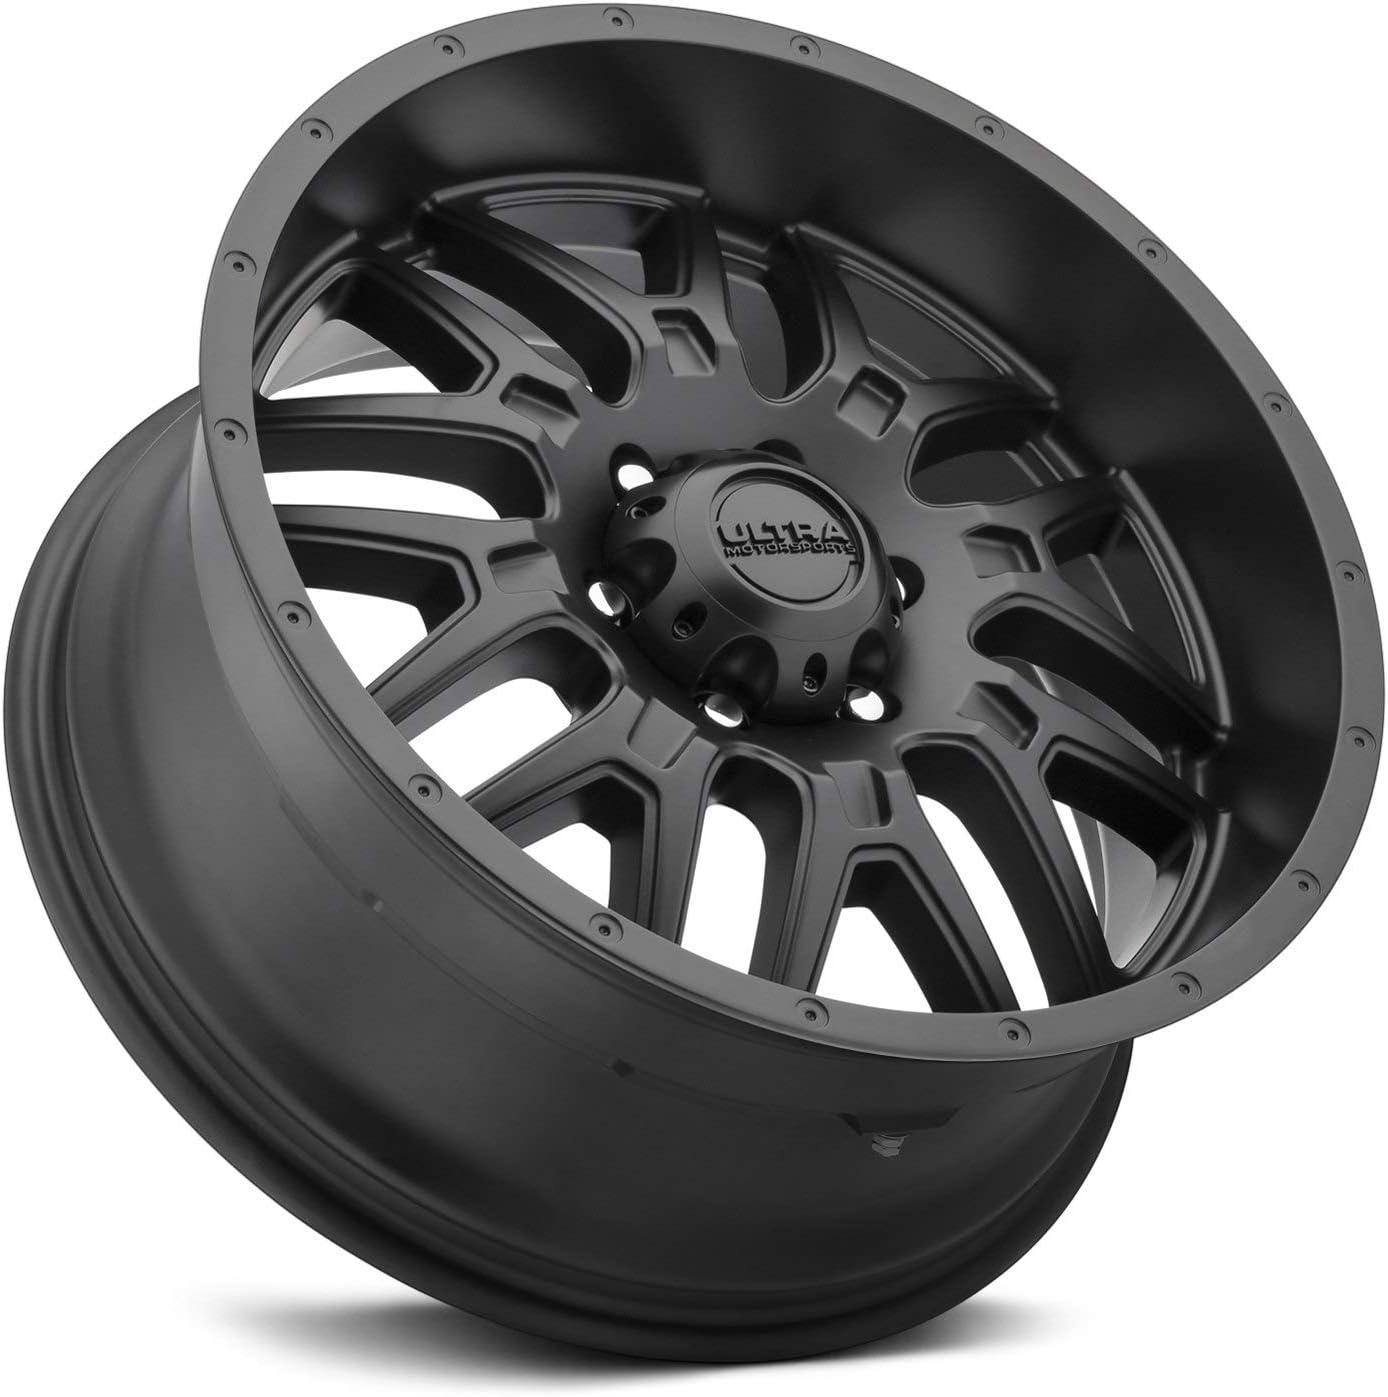 0 x 9. inches //6 x 135 mm, 18 mm Offset ULTRA 203SB HUNTER BLACK Wheel Satin Clear-Coat